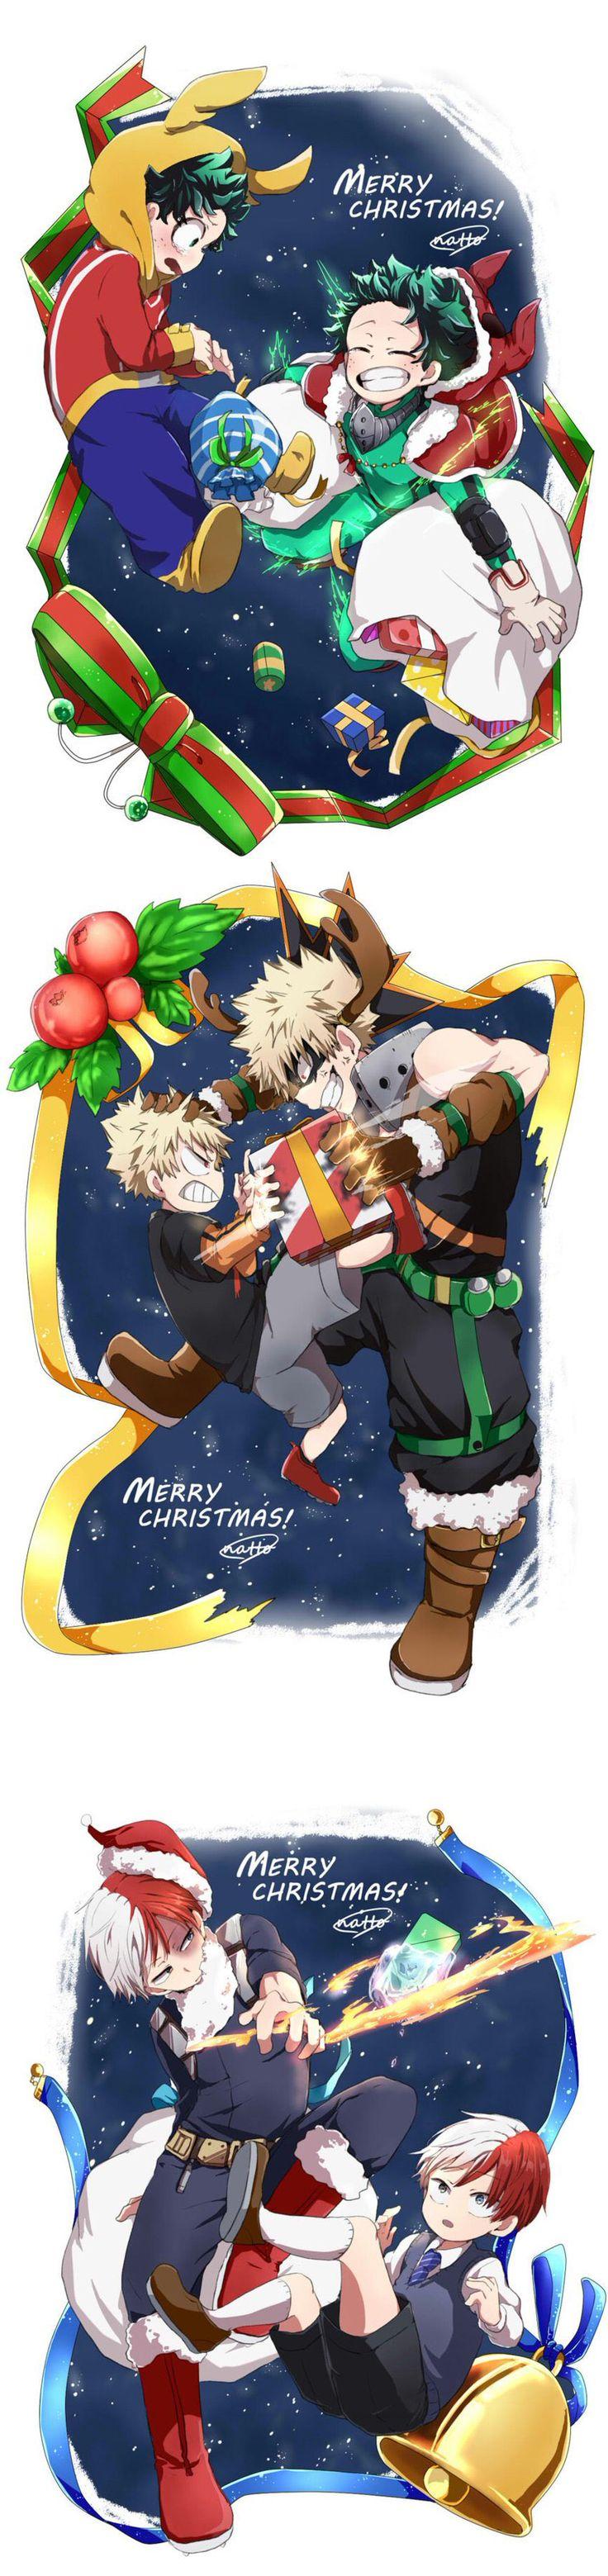 Characters: Midoriya Izuku, Katsuki Bakugou, Todoroki Shouto (Merry Christmas)